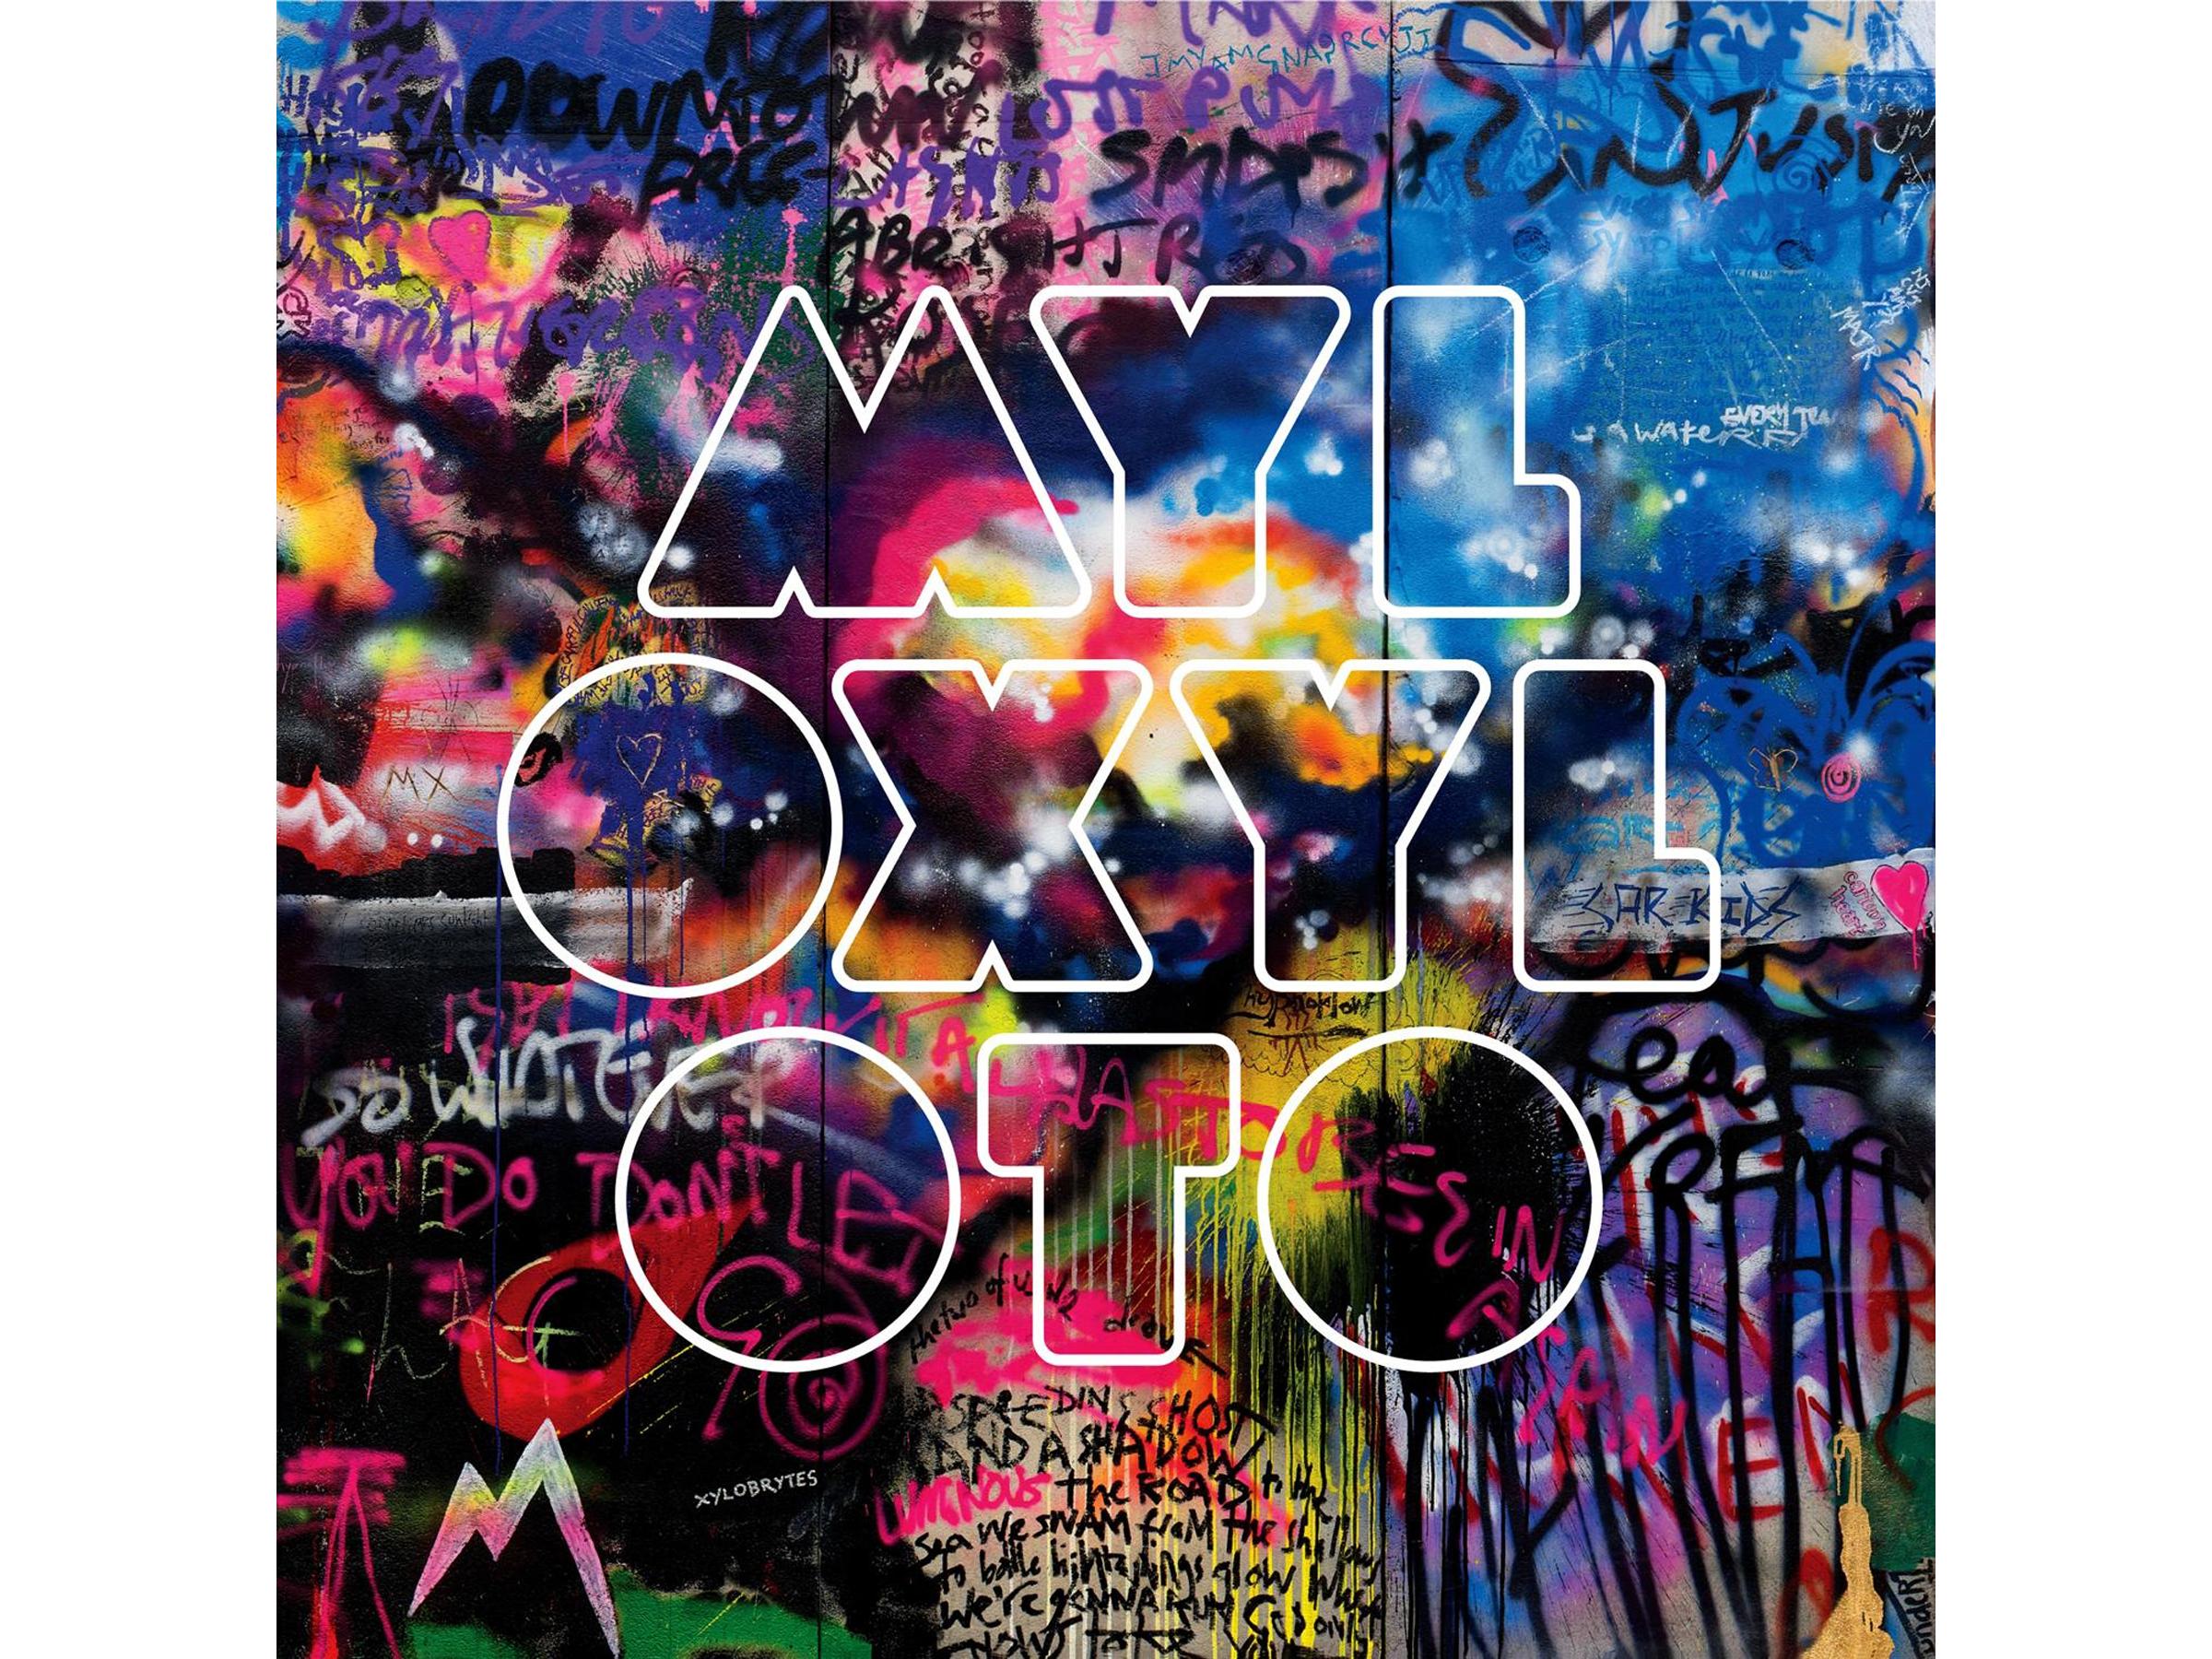 coldplaymyloxylotoalbumcoverart music news reviews